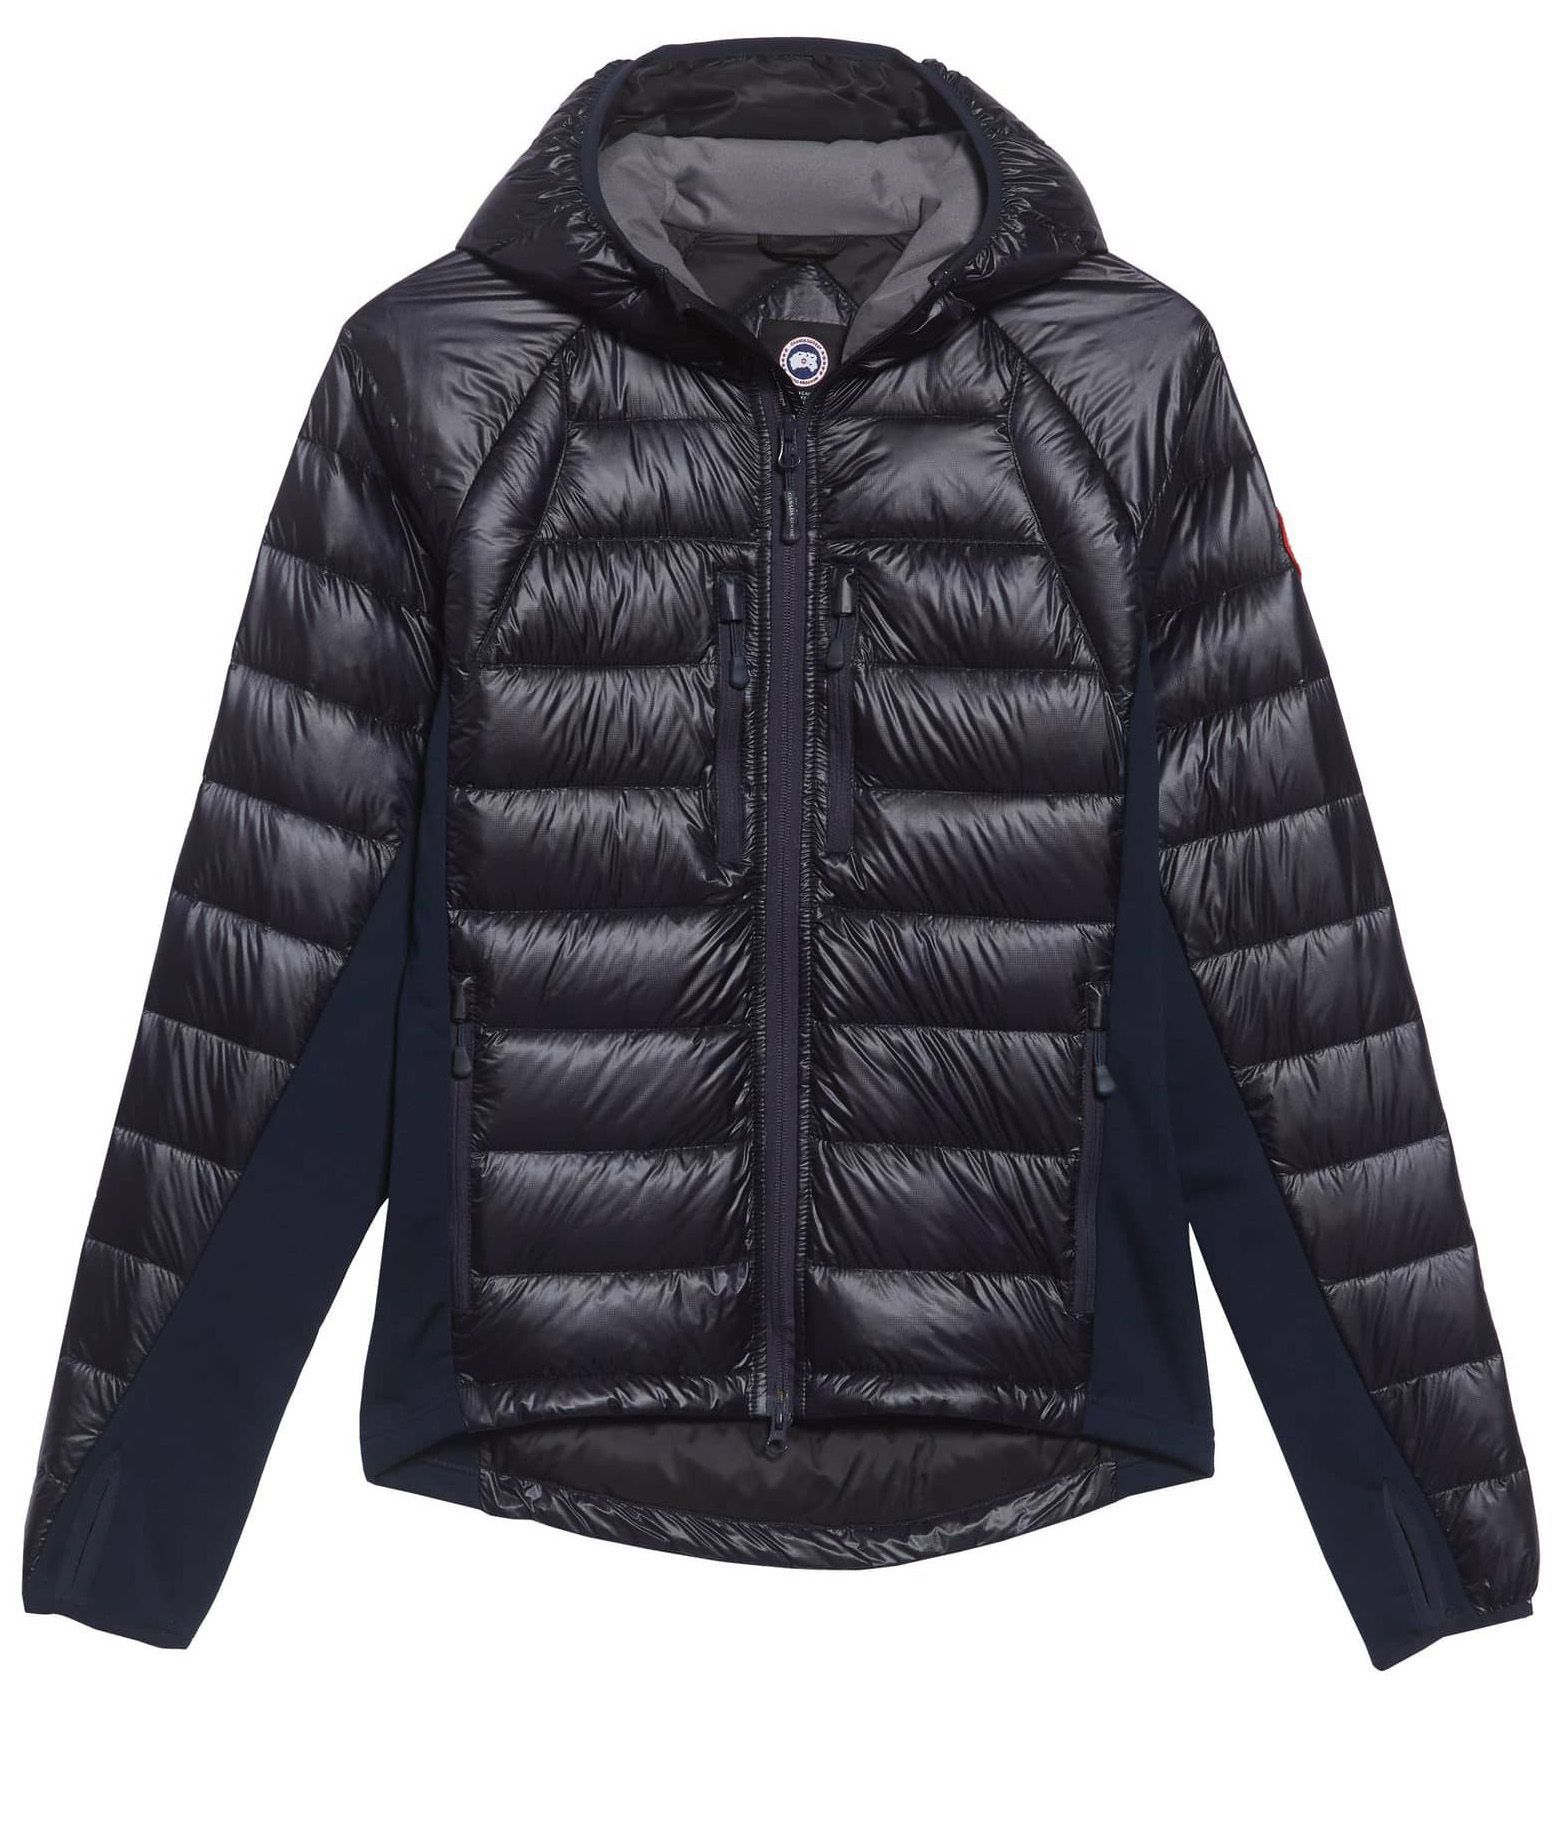 2d2d20840fa 30 Best Winter Coats 2018 - Warmest Men s Jackets for Cold Weather